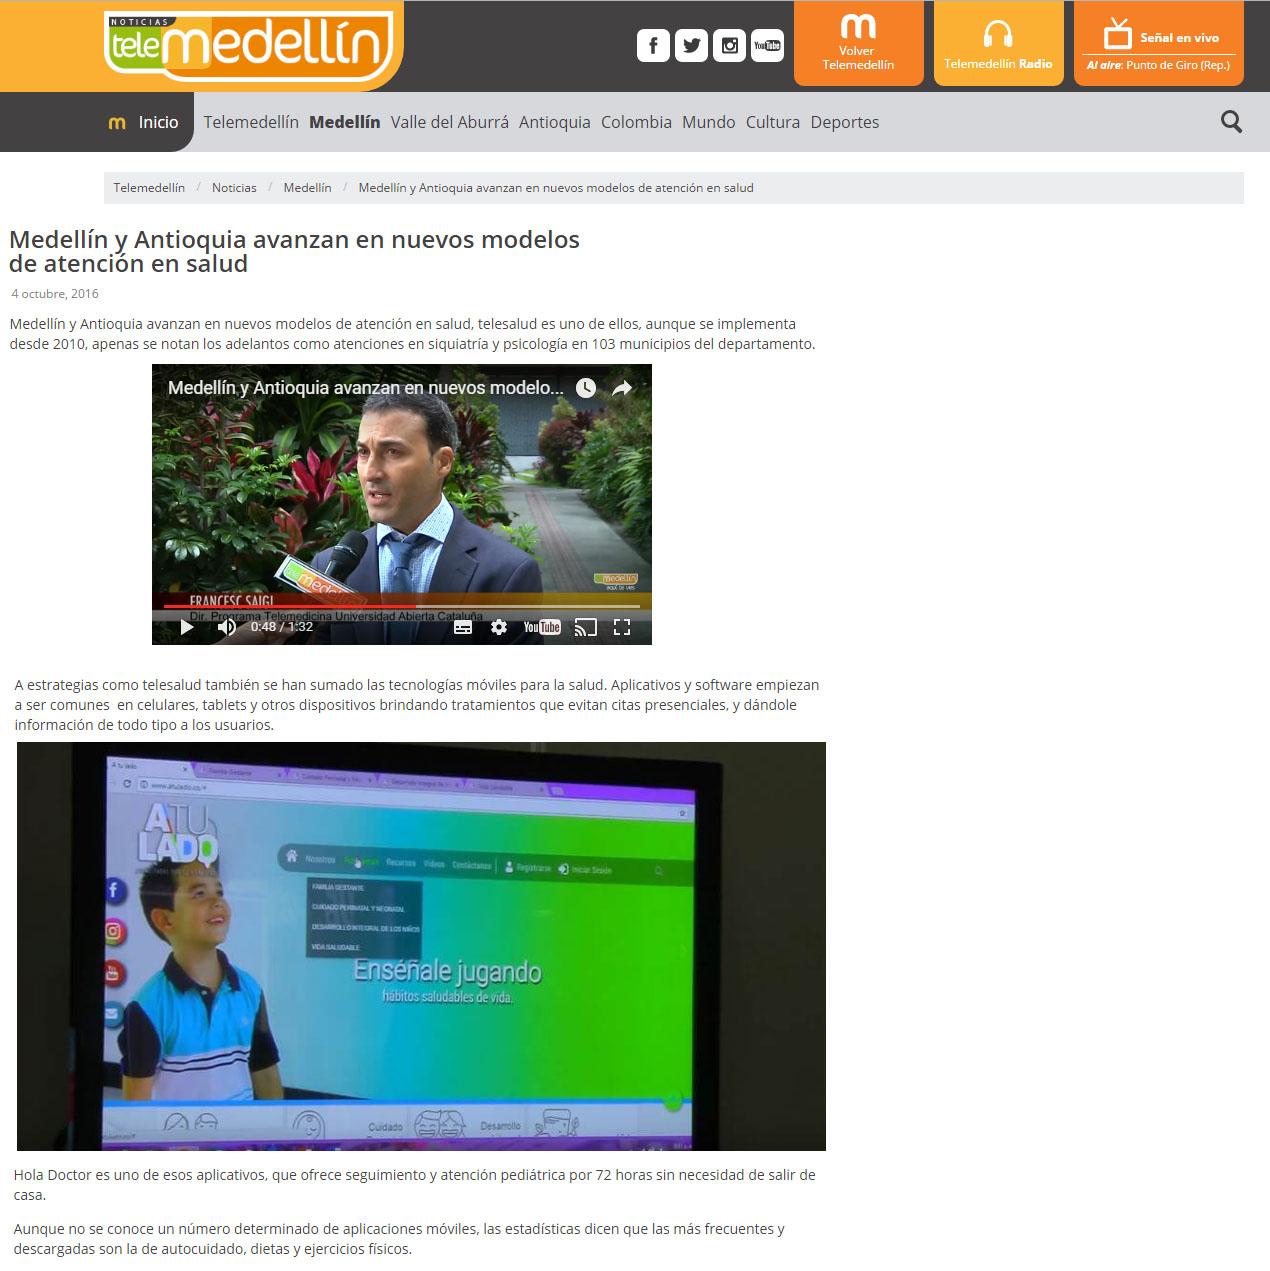 telemedellin.tv 04 de oct 2016